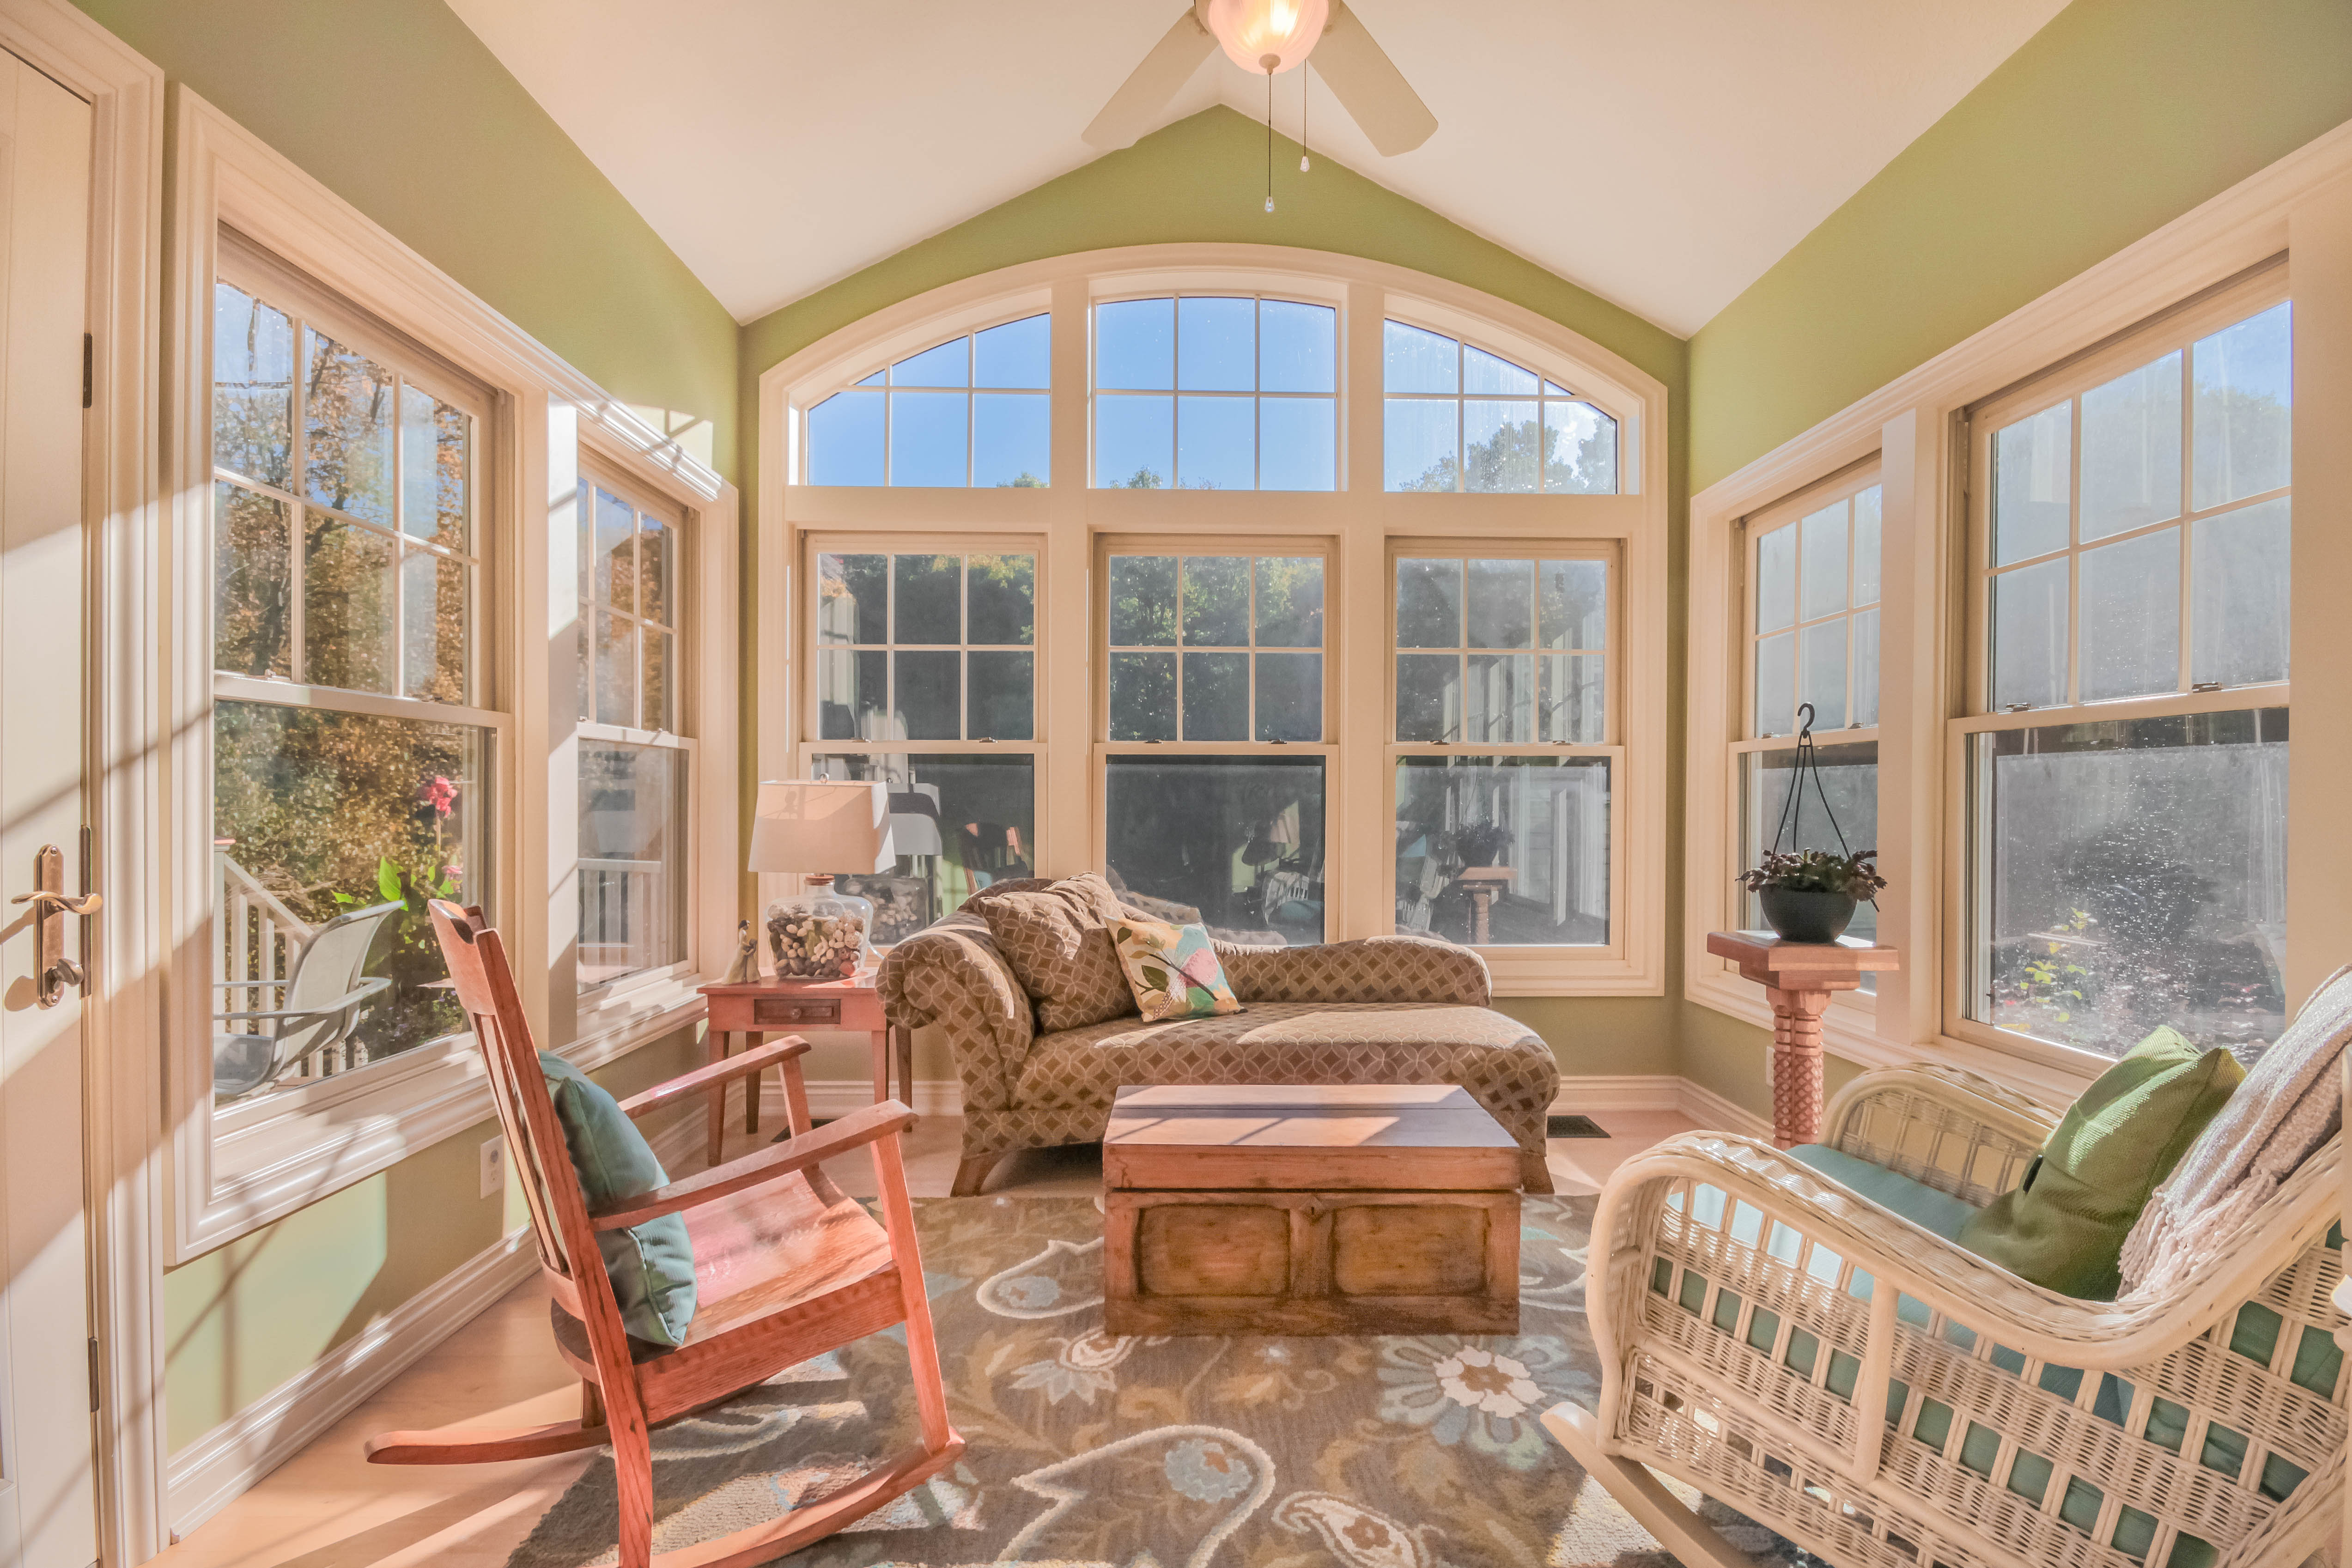 Forest Hills Million Dollar Homes For Sale